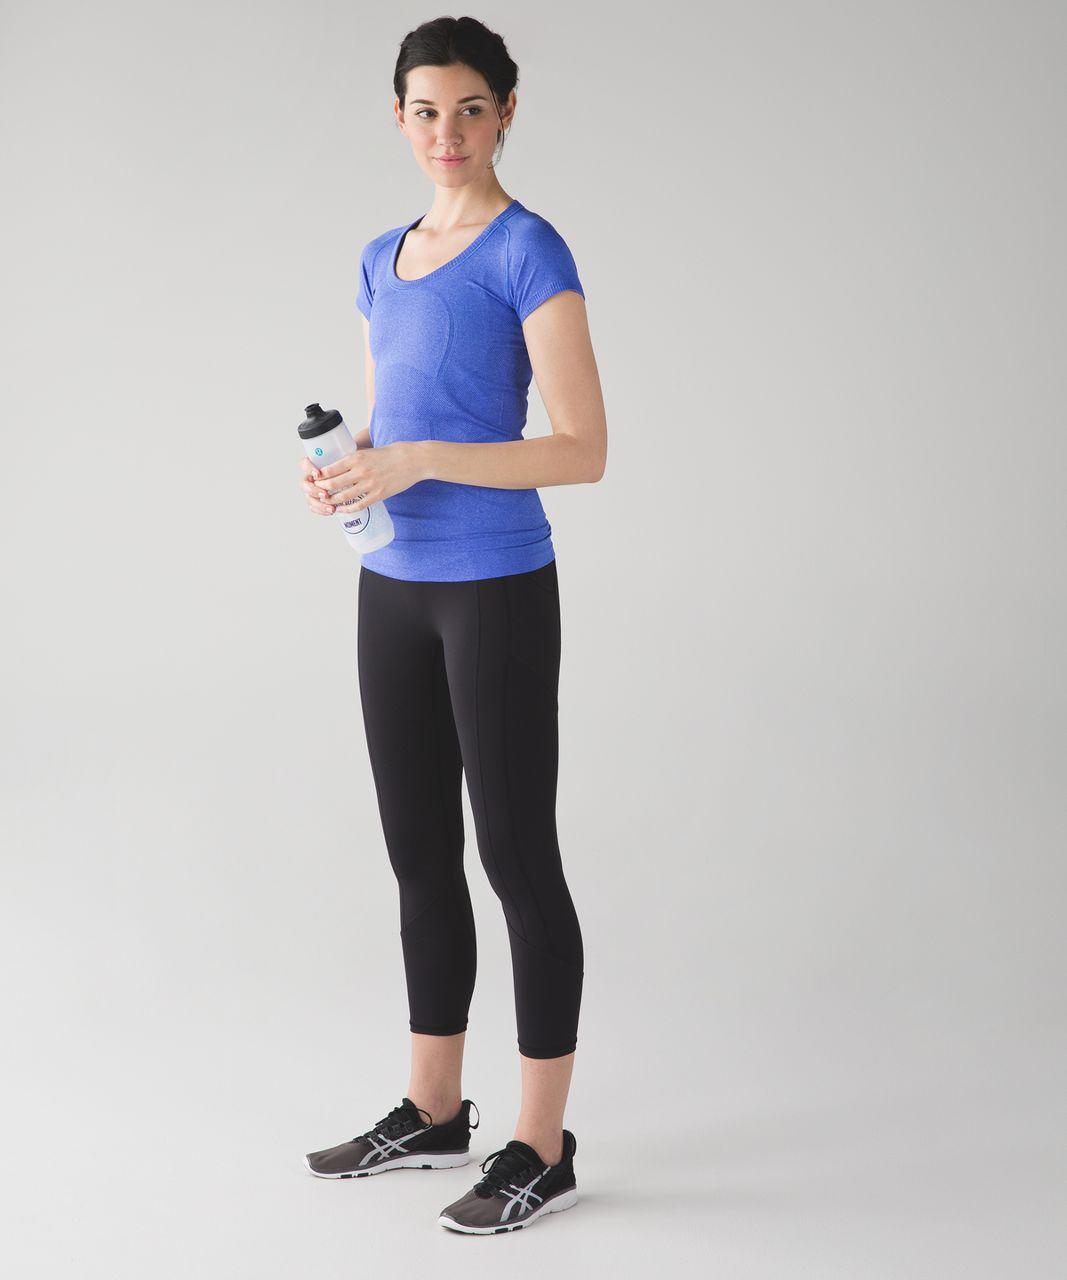 Lululemon Swiftly Tech Short Sleeve Scoop - Heathered Harbor Blue